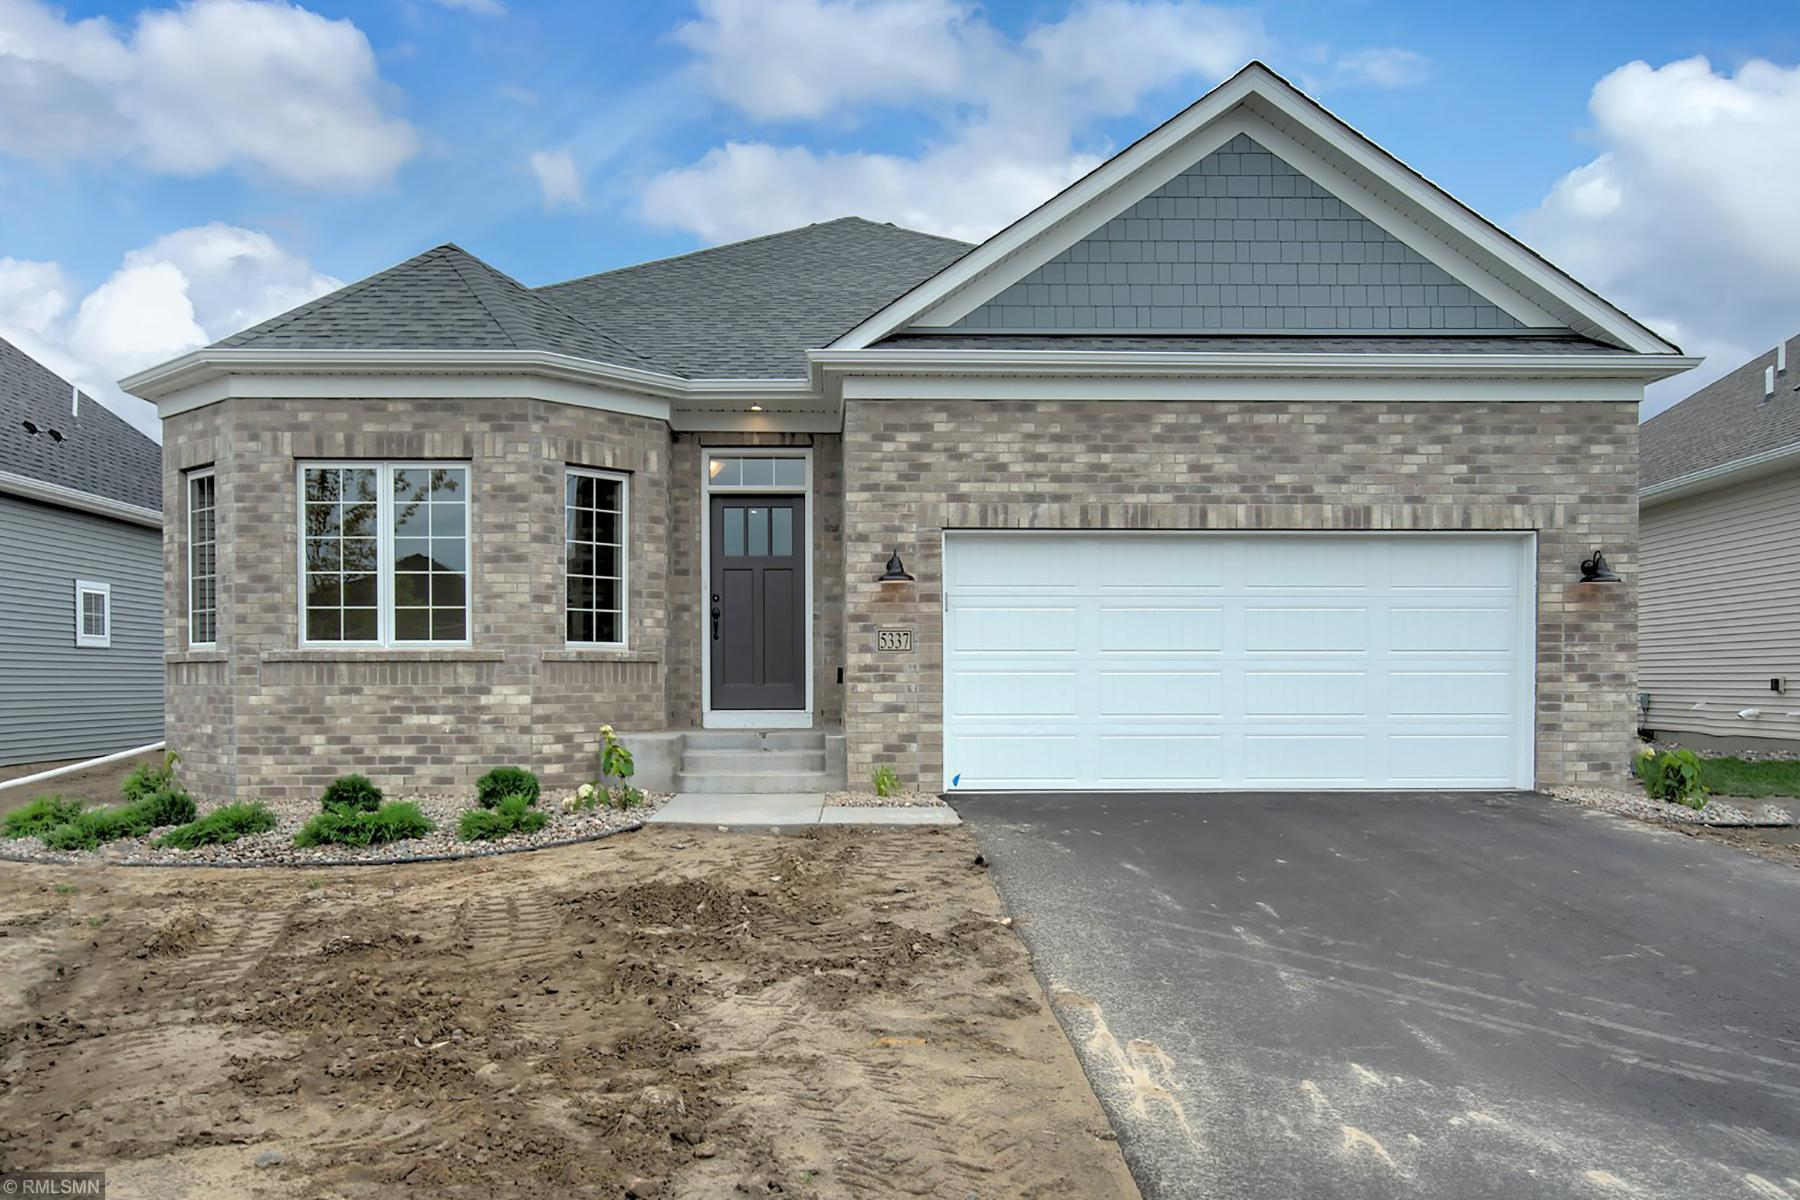 5337 130th N Property Photo - Hugo, MN real estate listing